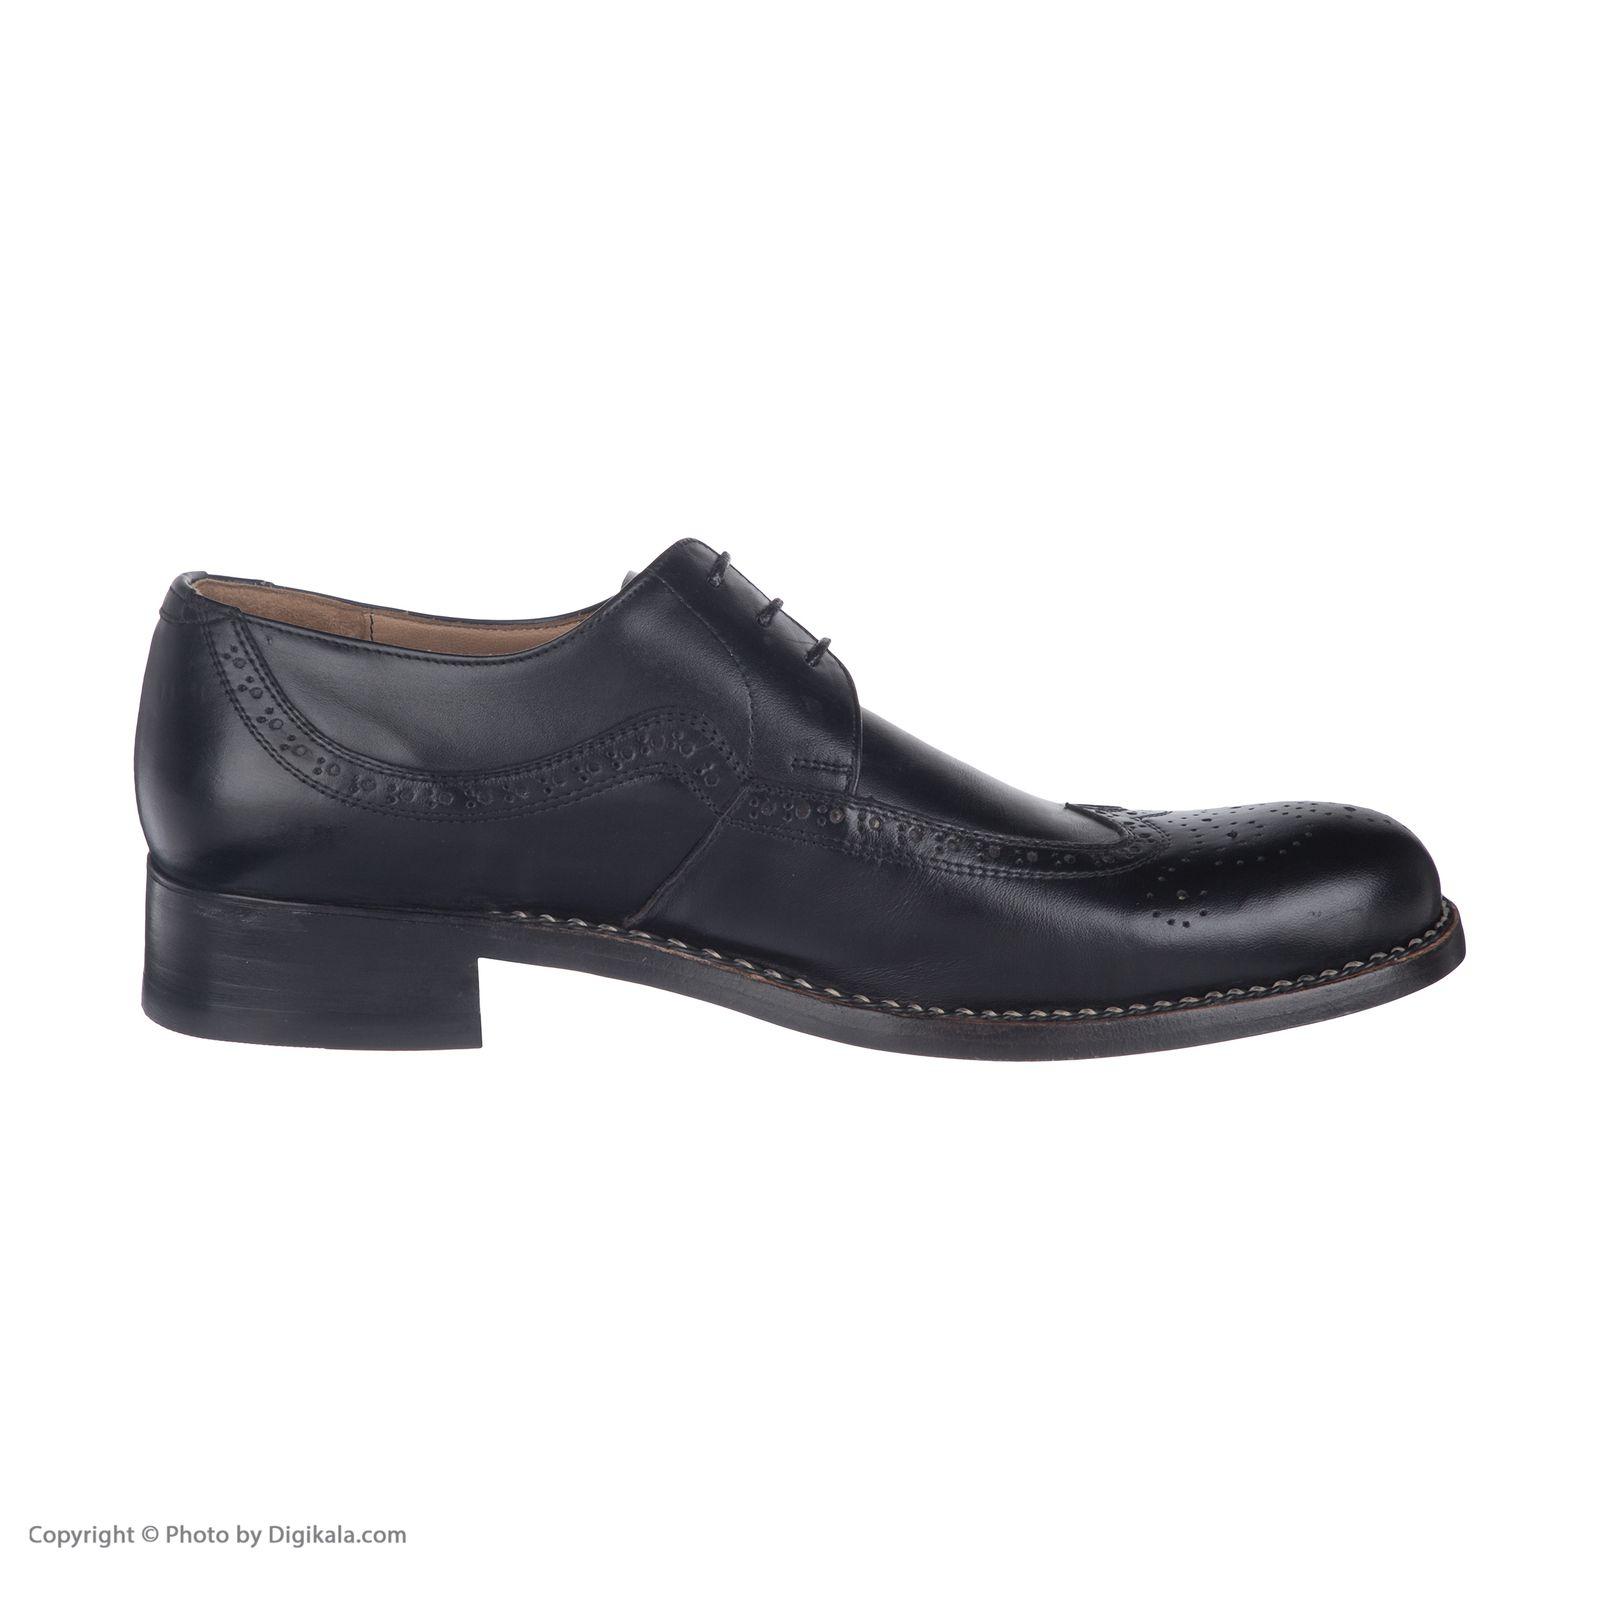 کفش مردانه نظری کد 401 -  - 5